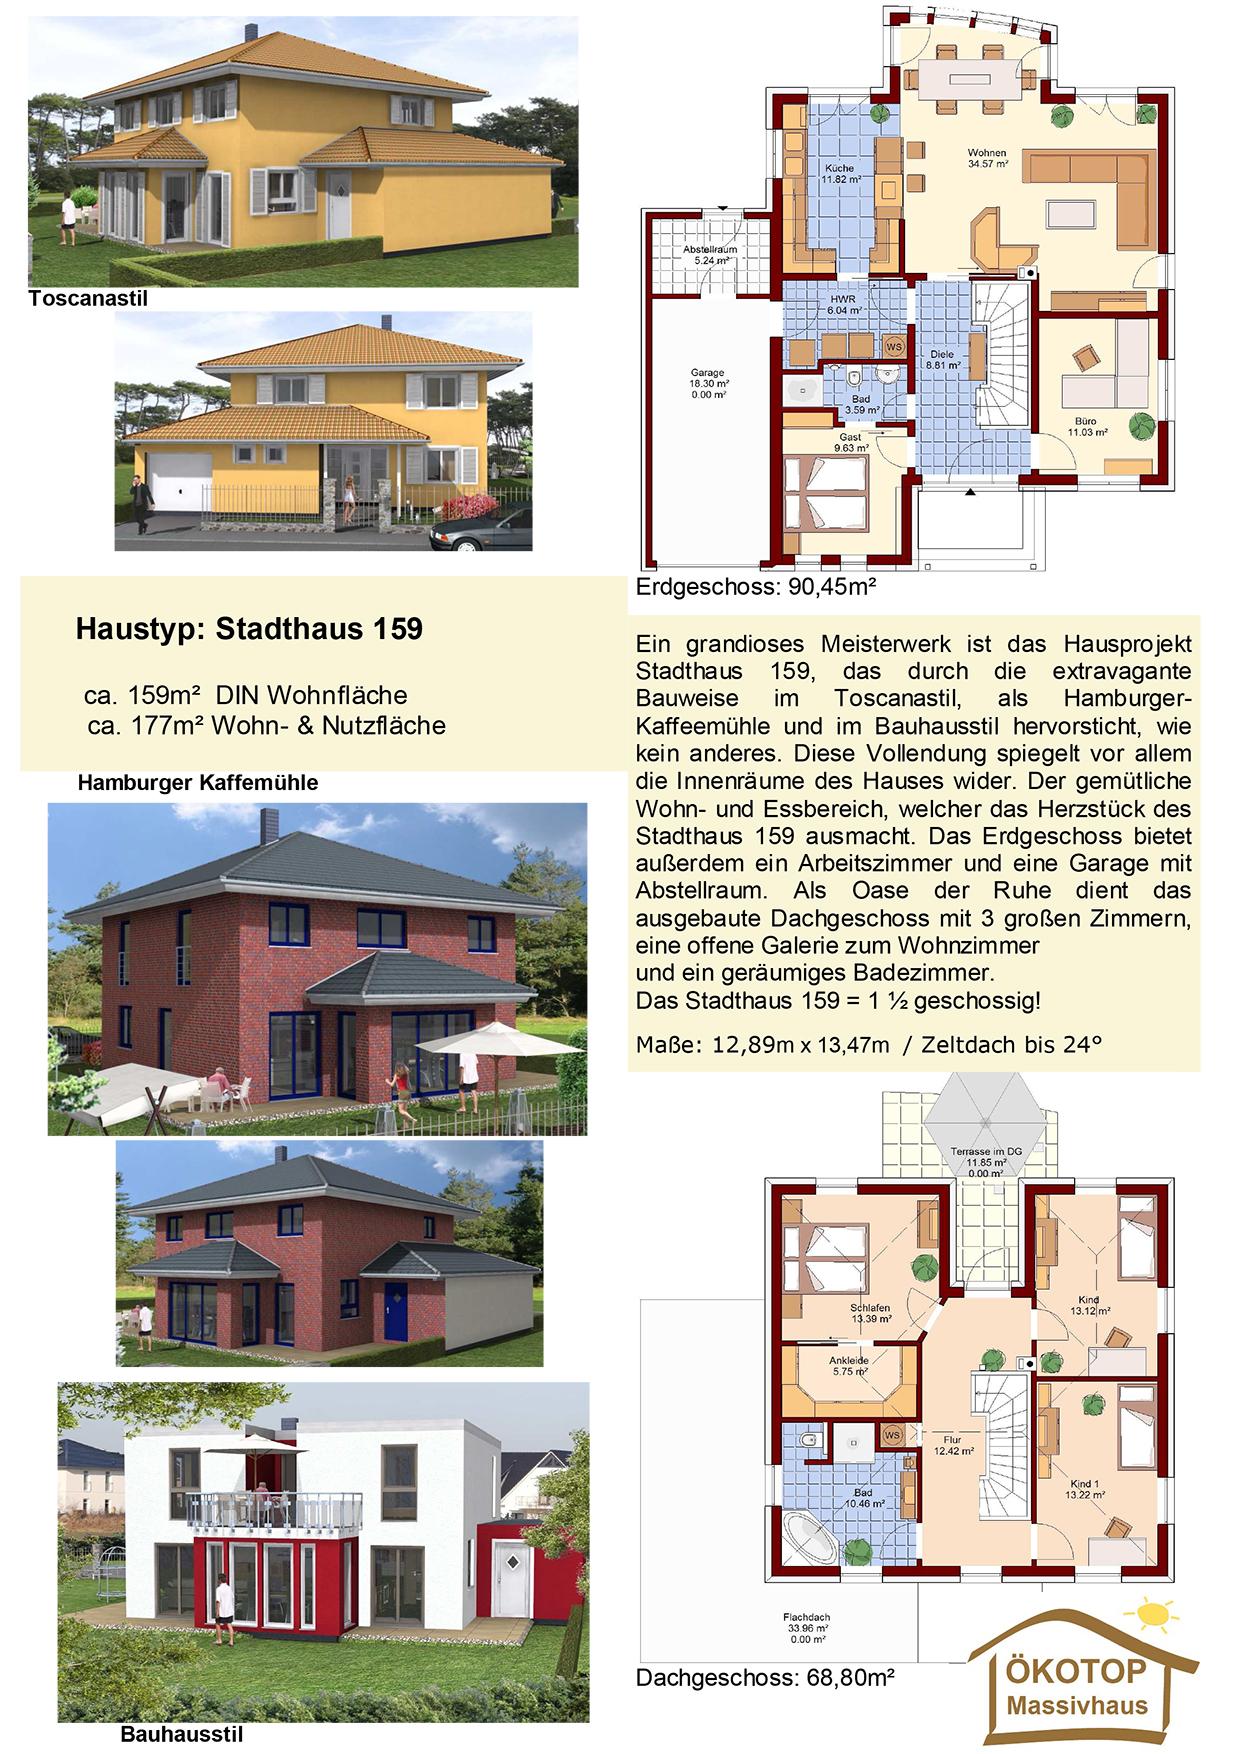 ÖKOTOP-Massivhaus-Stadthaus-159